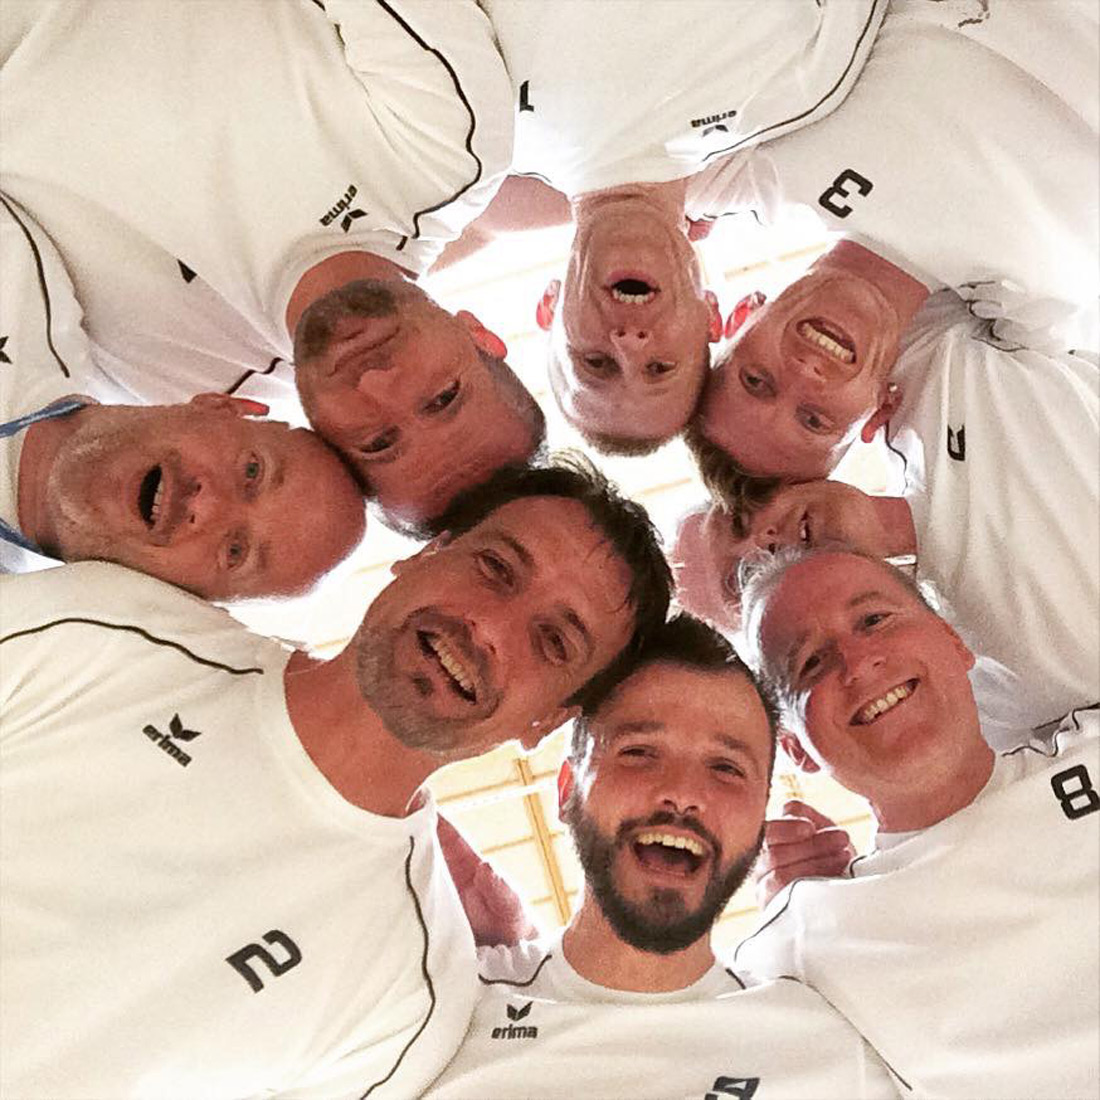 Karl and his Team EuroGames Helsinki 2016   Gay Travel Berlin Goldelsen-Cup Volleyball Tournament © CoupleofMen.com